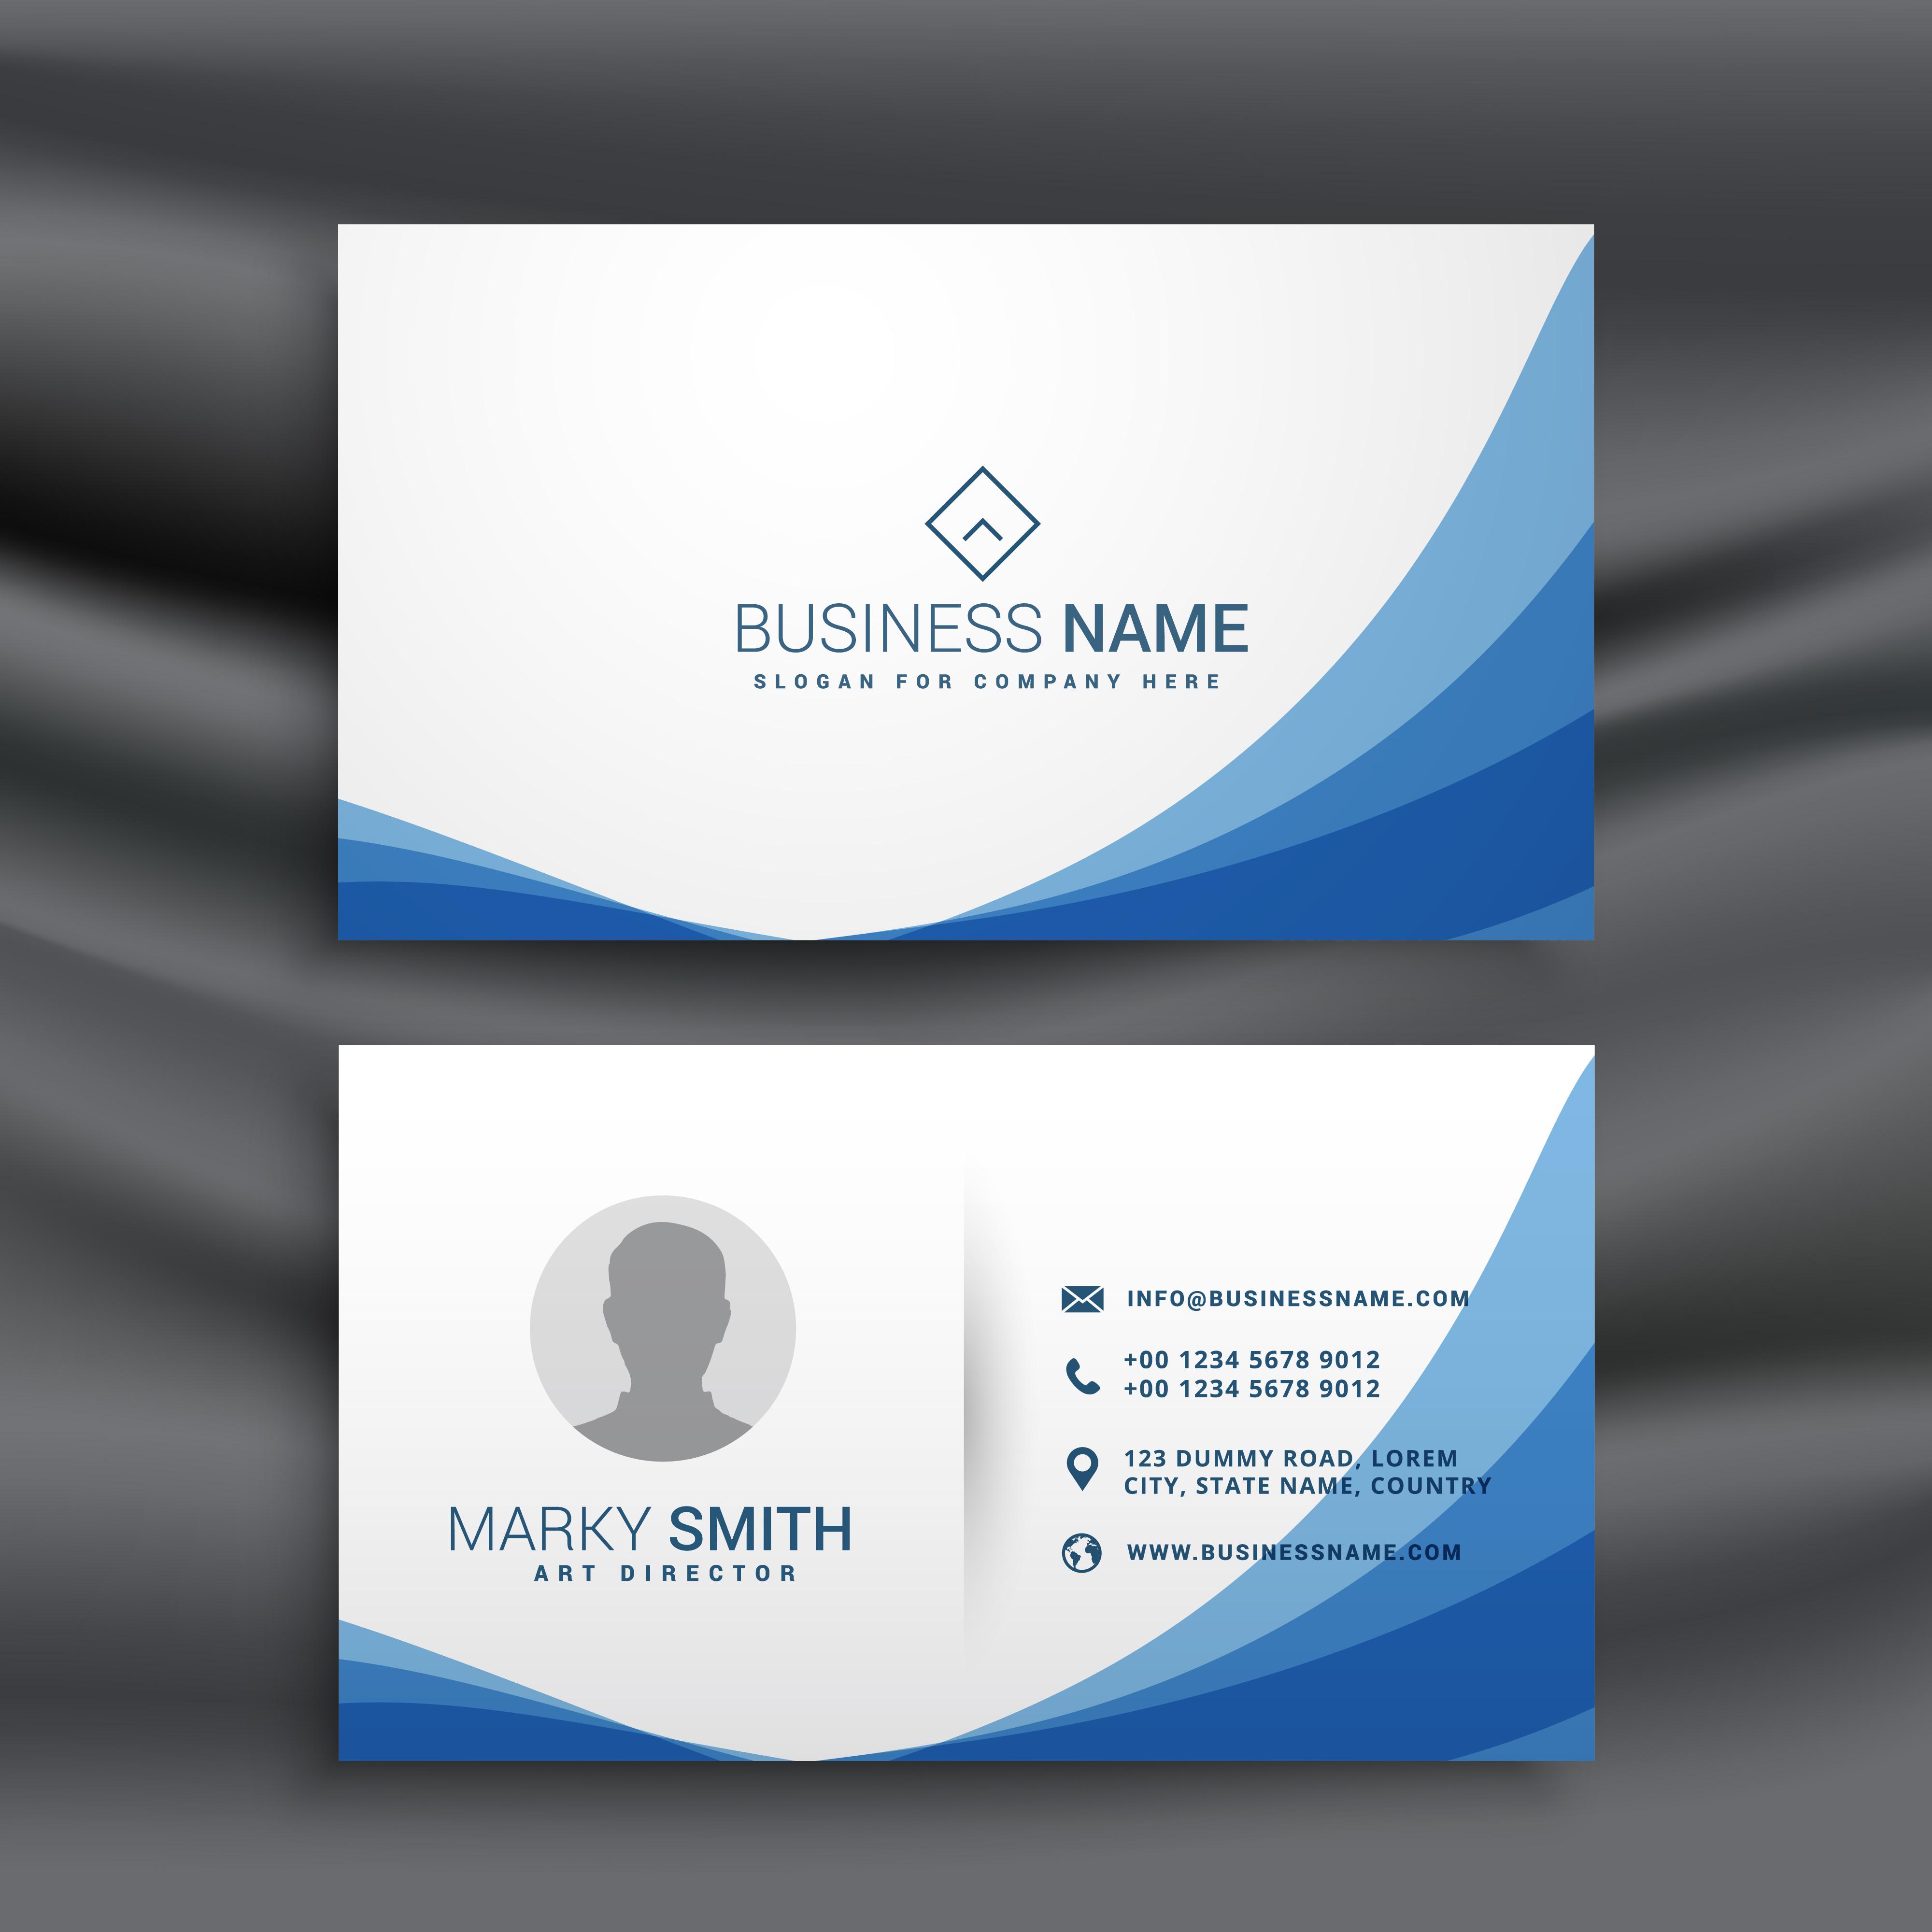 blue wave simple business card design template download free vector art stock graphics images. Black Bedroom Furniture Sets. Home Design Ideas